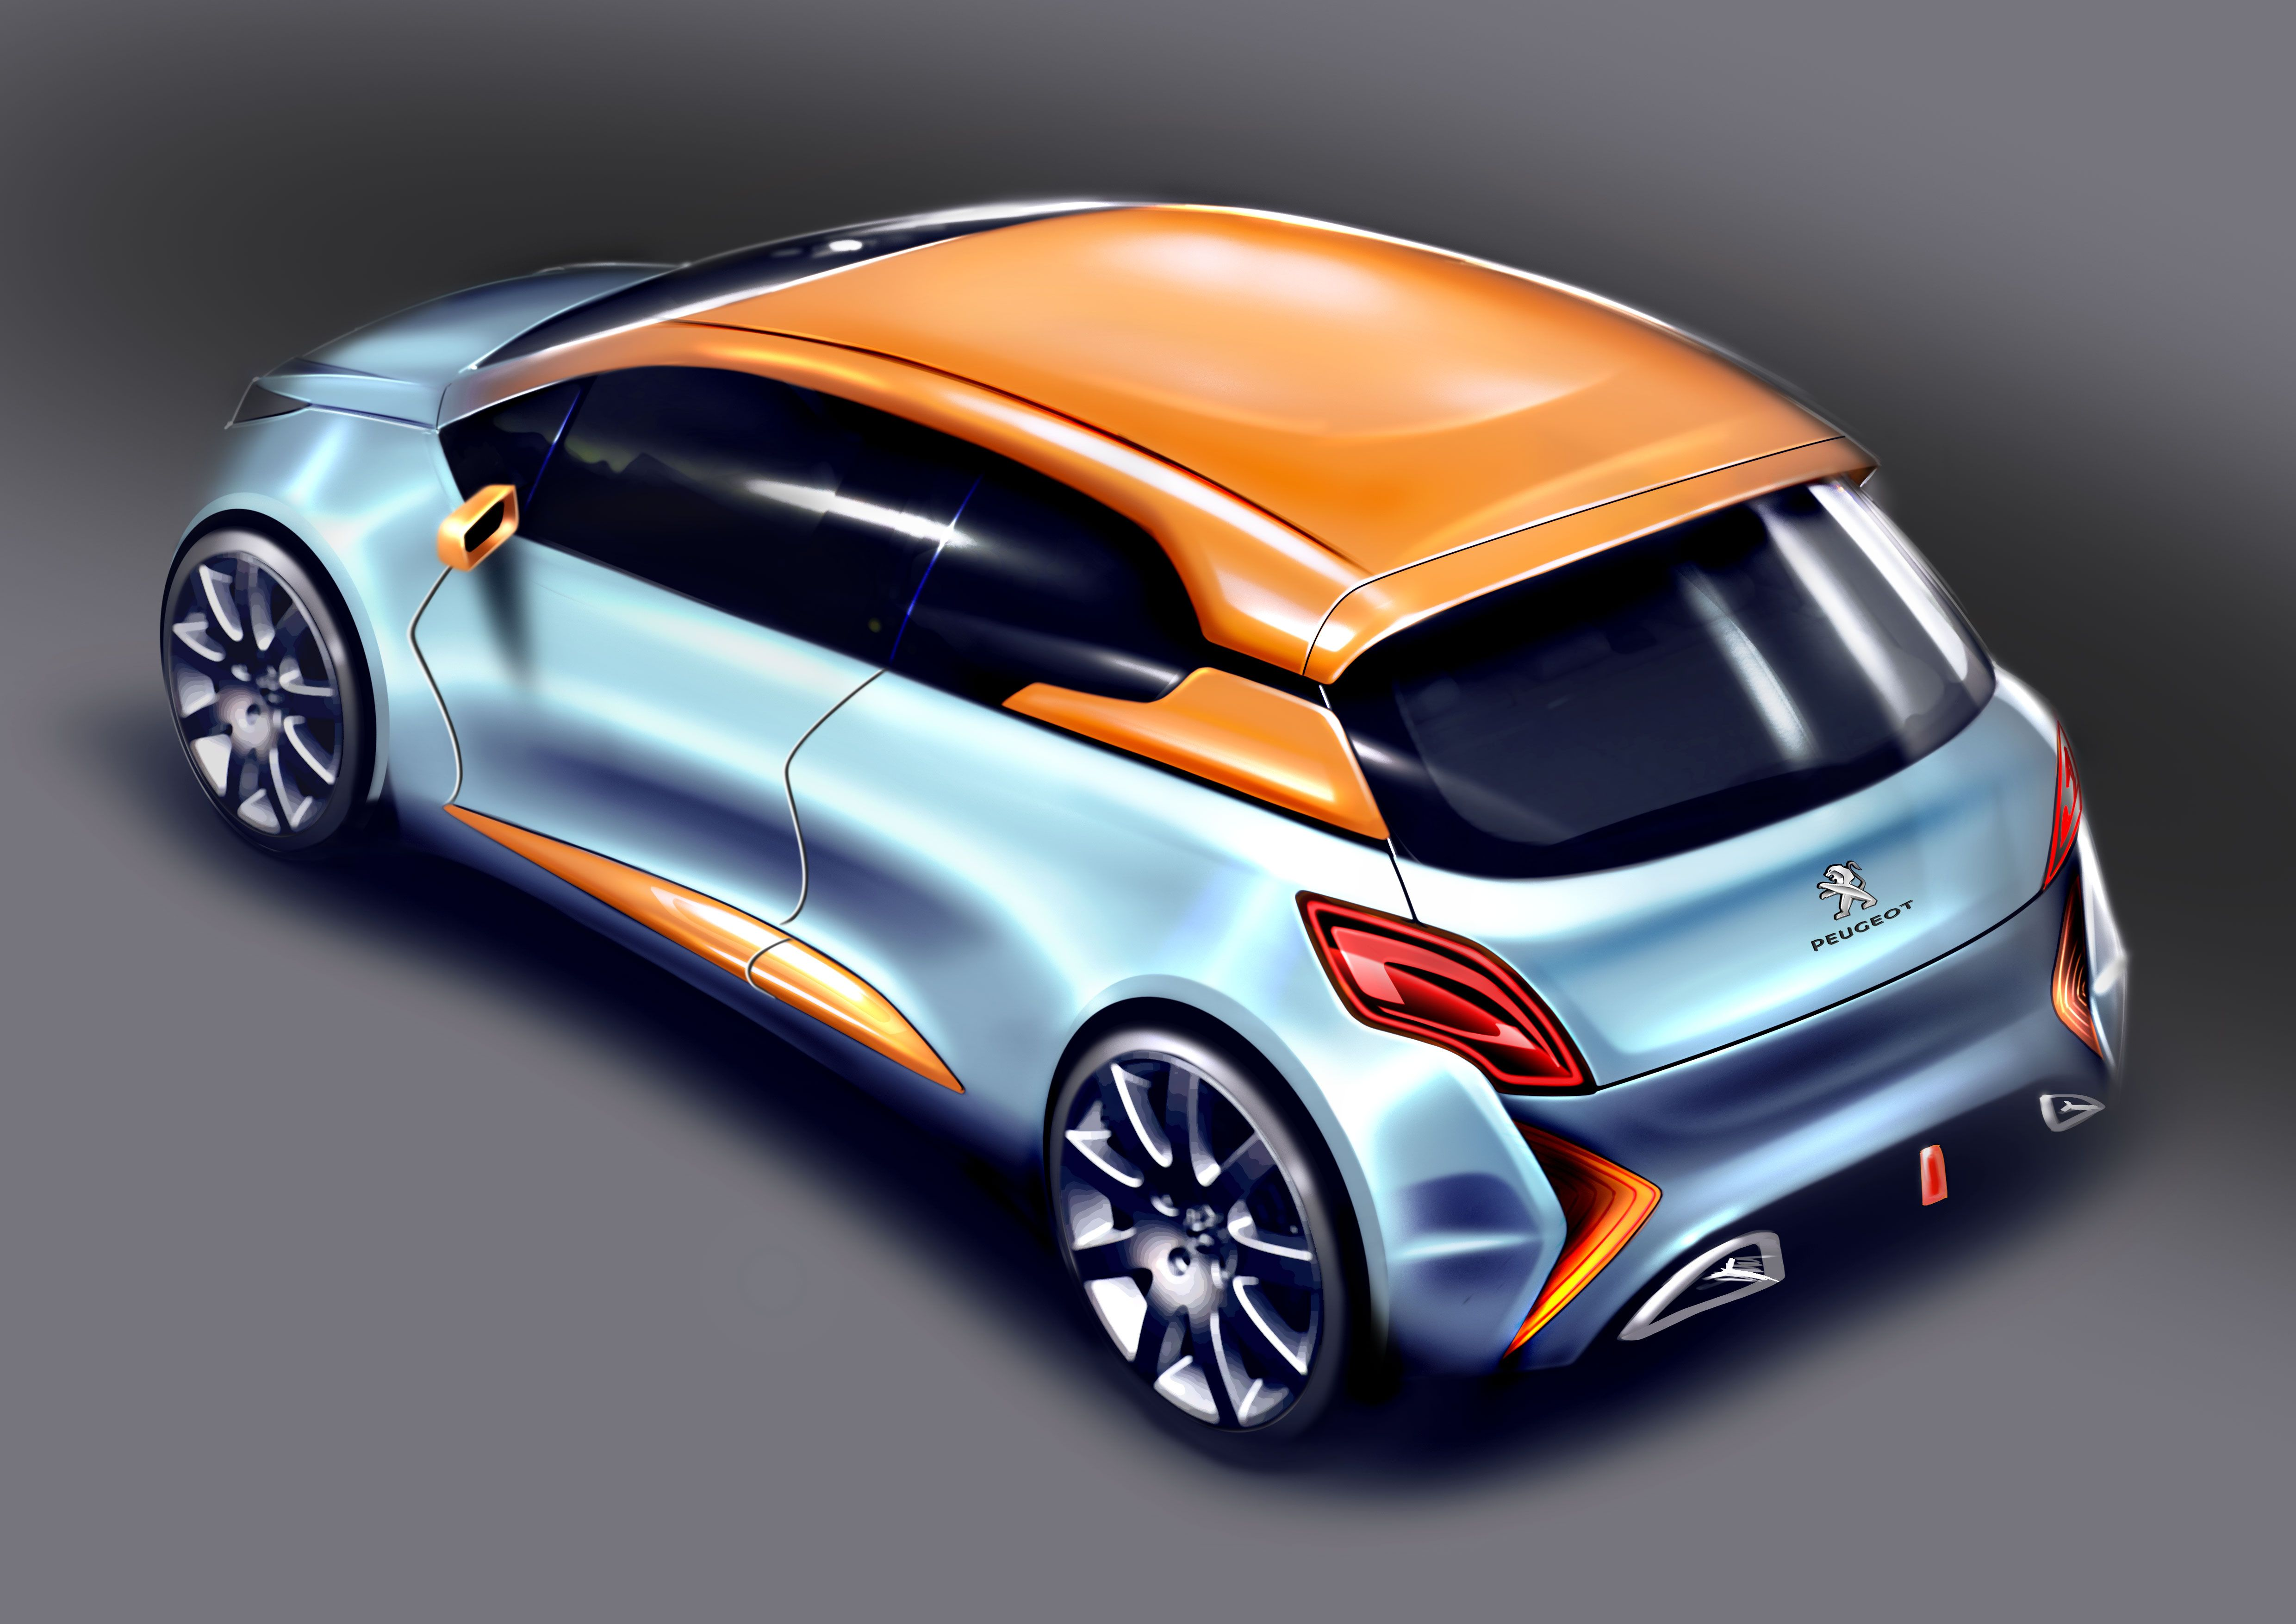 Design my car - Peugeot 206 Concept Sketch Automotive Car Design Photoshop Sketch Render Alessandro_zanotti